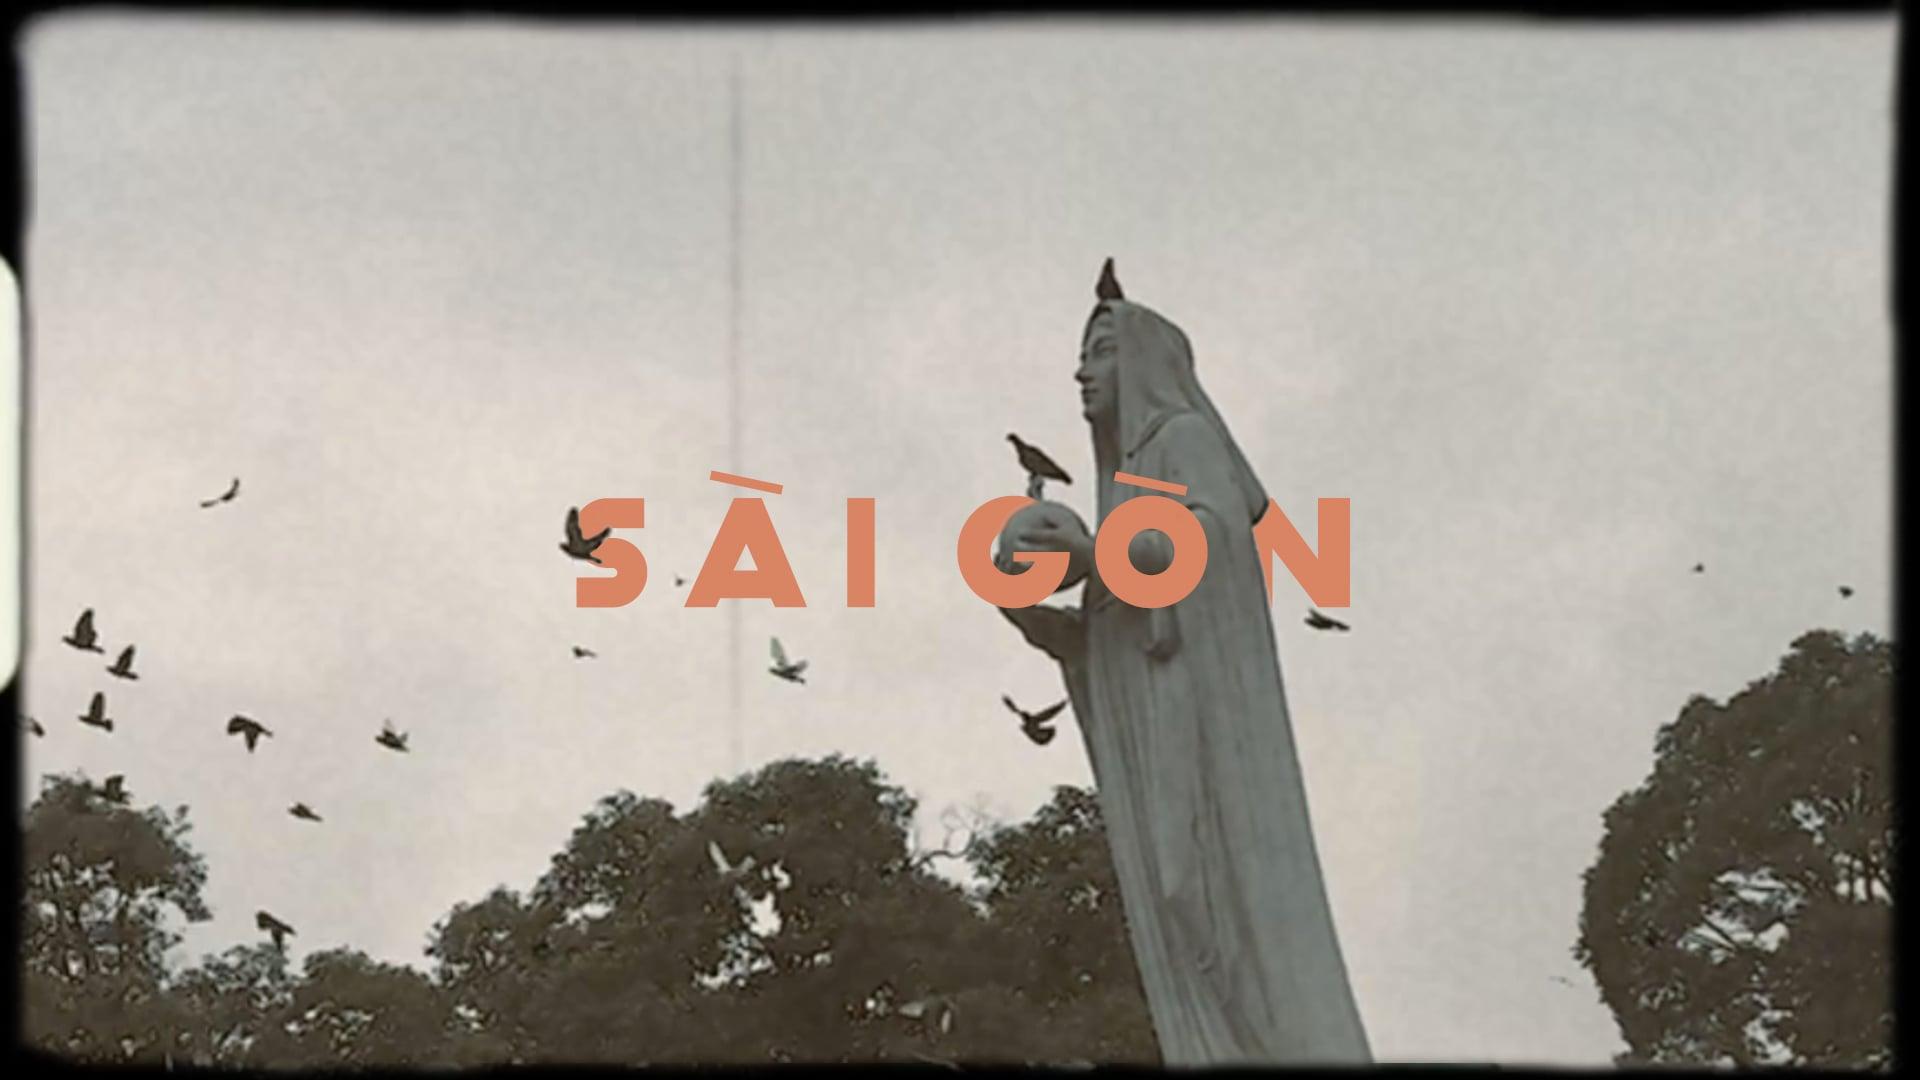 Saigon, In One Minute